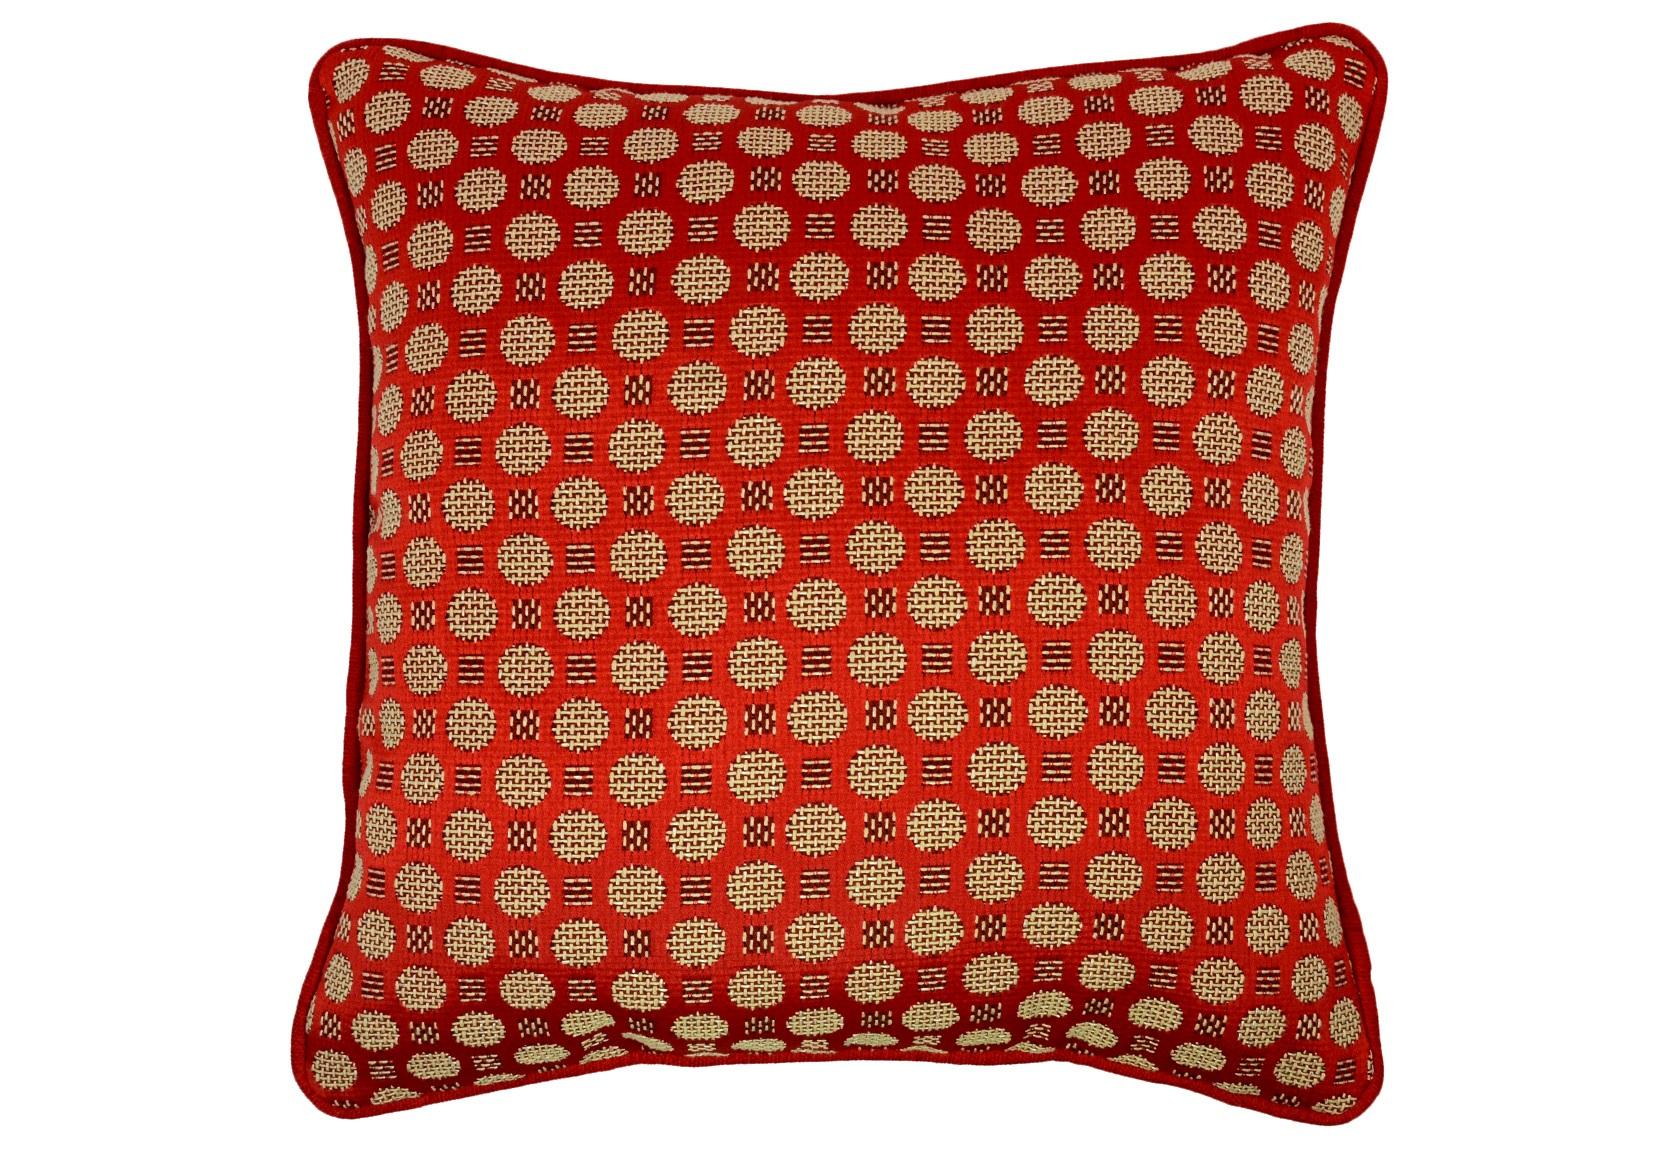 Подушка AlkorКвадратные подушки<br>Декоративная  подушка .Чехол съемный.<br><br>Material: Вискоза<br>Length см: None<br>Width см: 45<br>Depth см: 15<br>Height см: 45